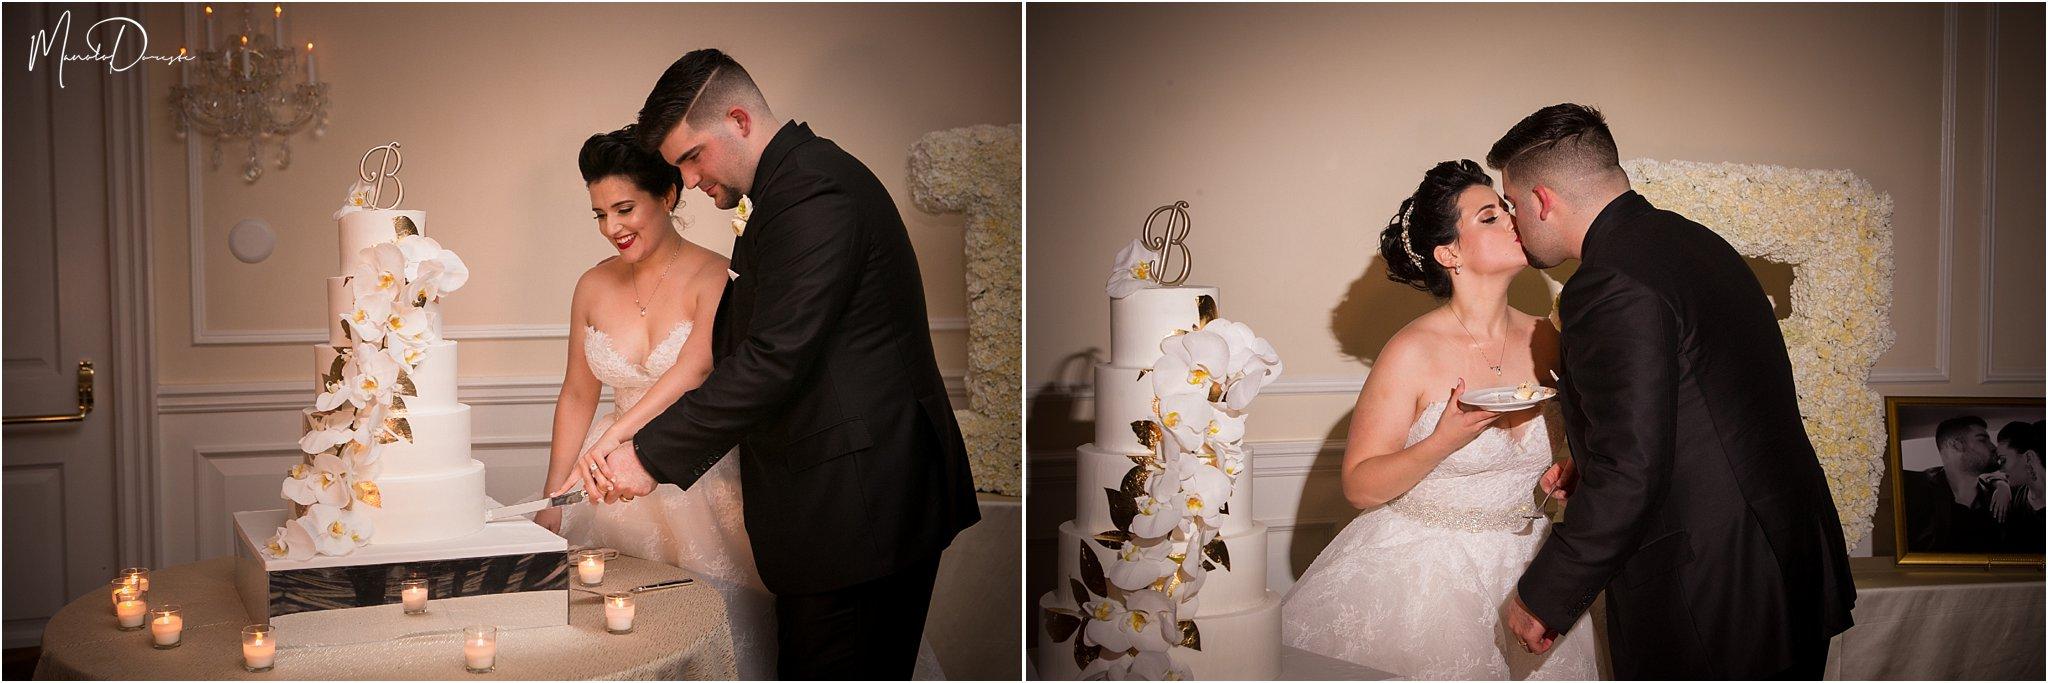 00973_ManoloDoreste_InFocusStudios_Wedding_Family_Photography_Miami_MiamiPhotographer.jpg